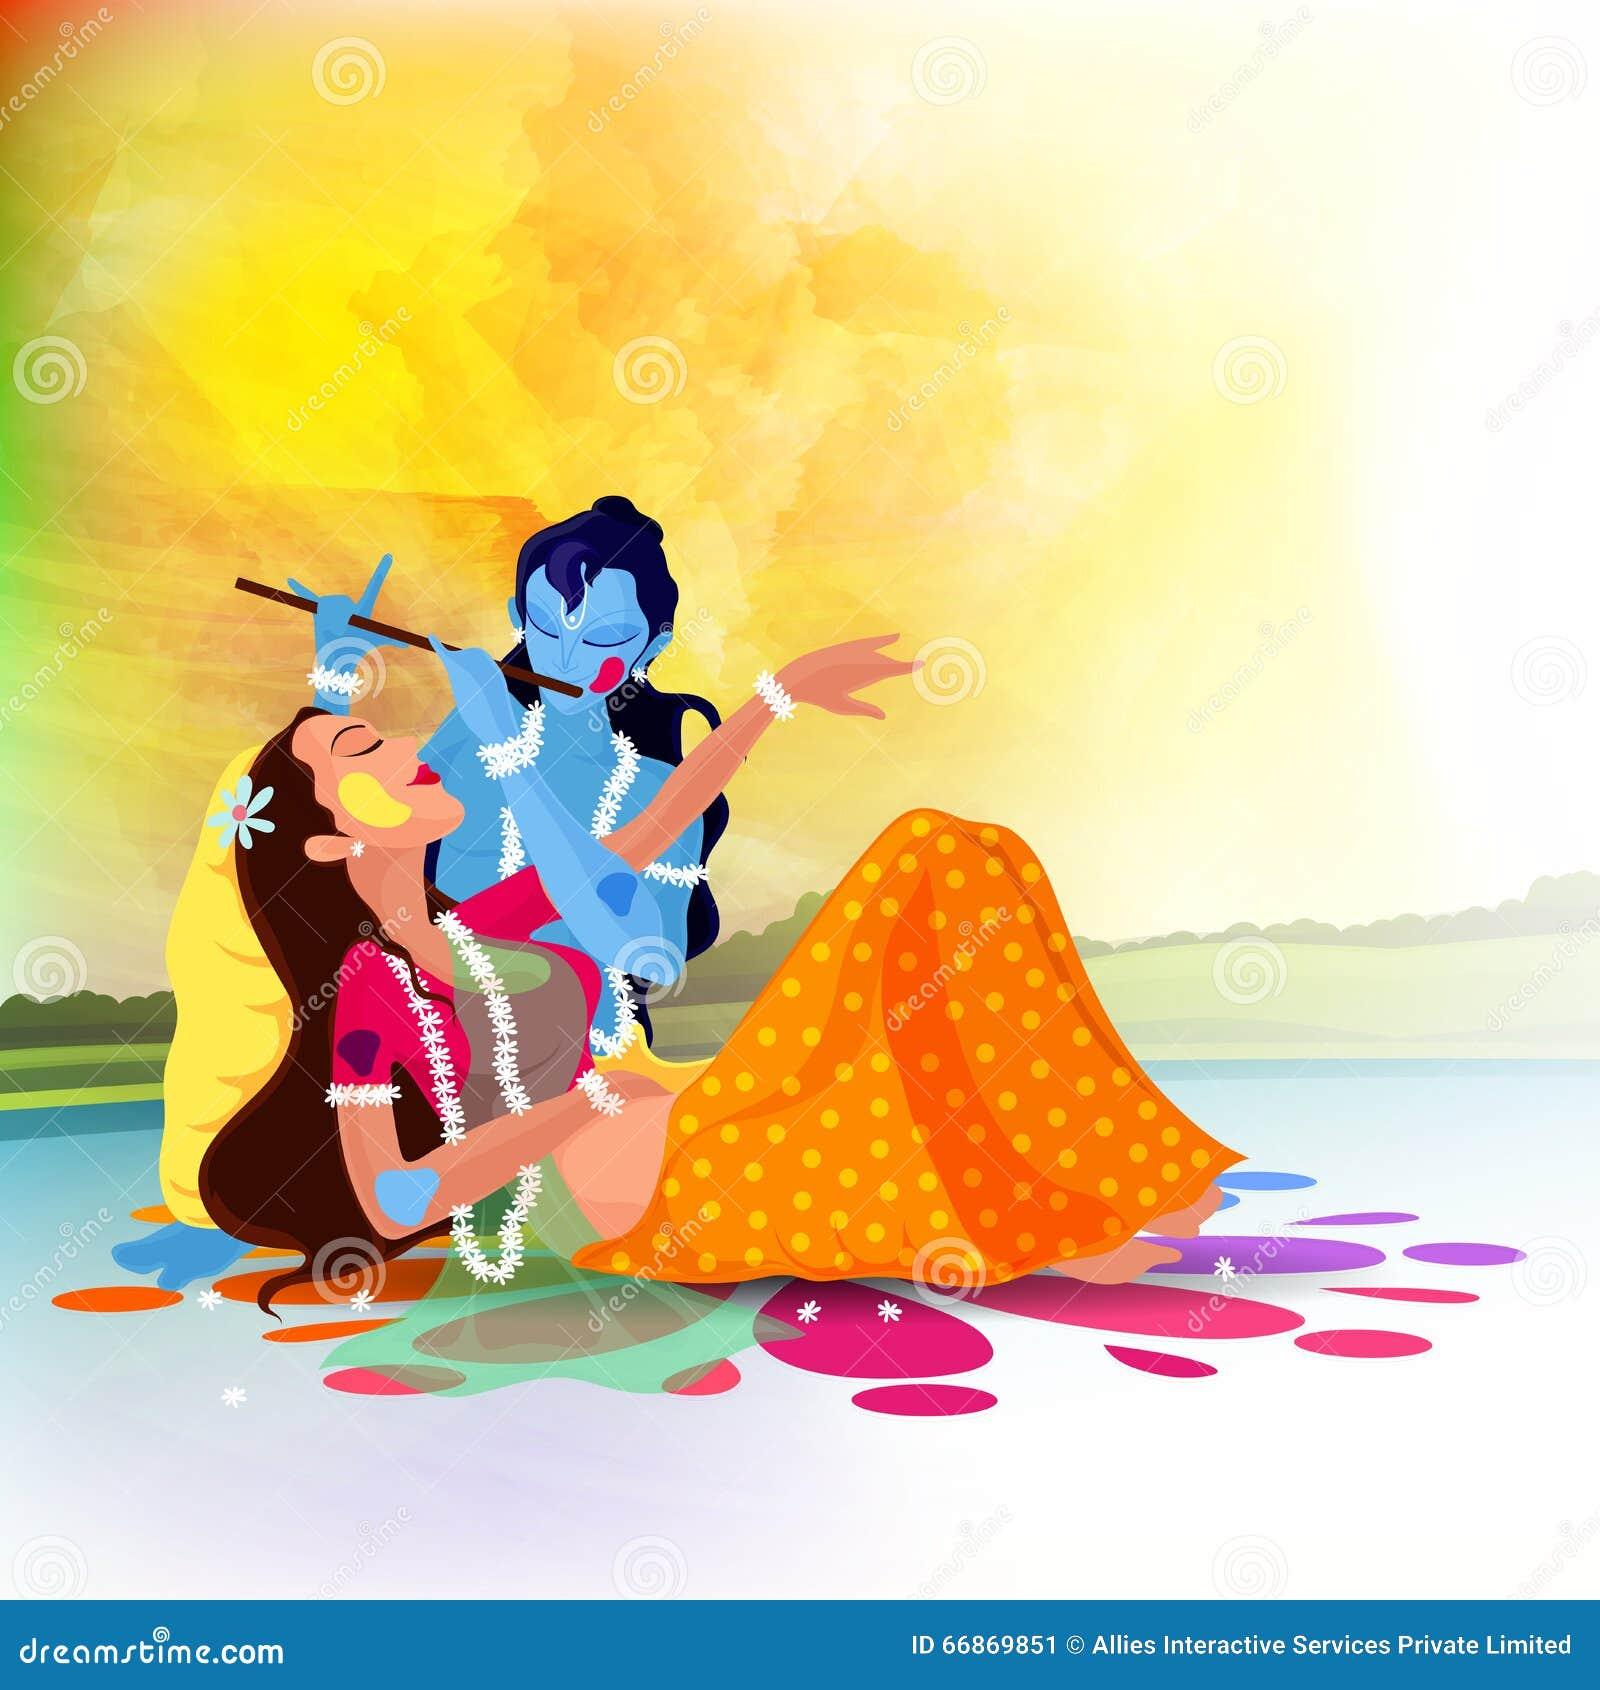 Goddess Radha With Lord Krishna For Holi Celebration. Stock ...